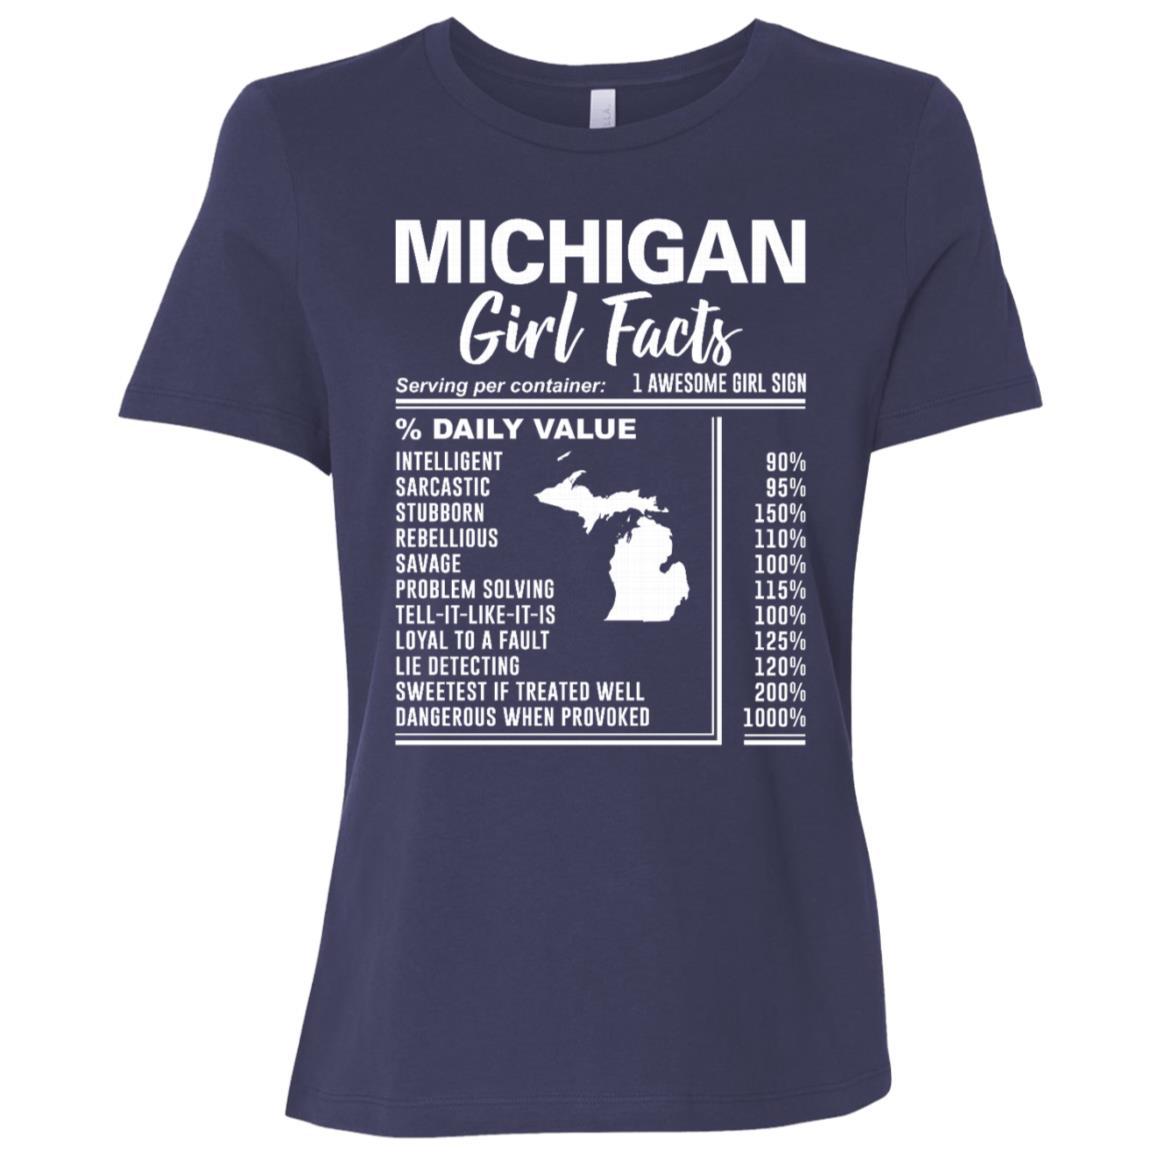 Born in Michigan – Michigan Girl Facts Women Short Sleeve T-Shirt